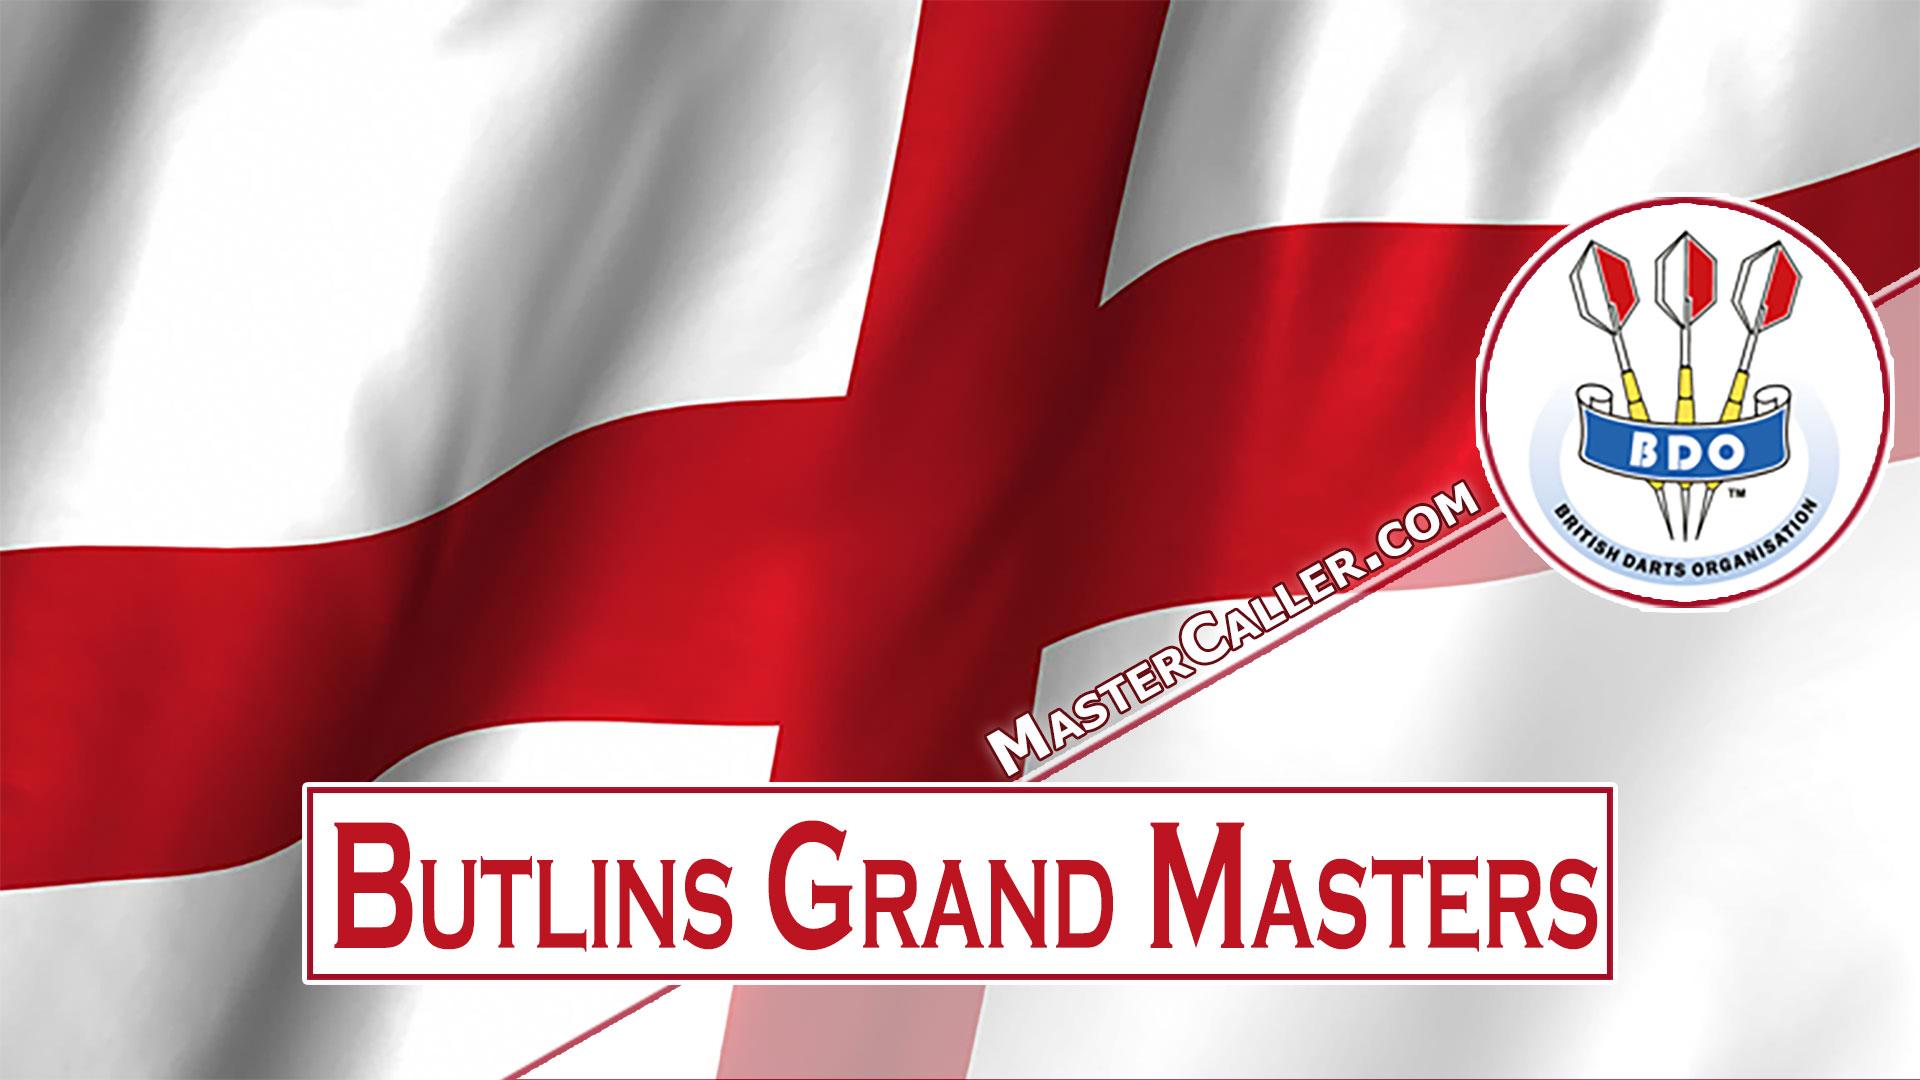 Butlins Grand Masters - 1980 Logo